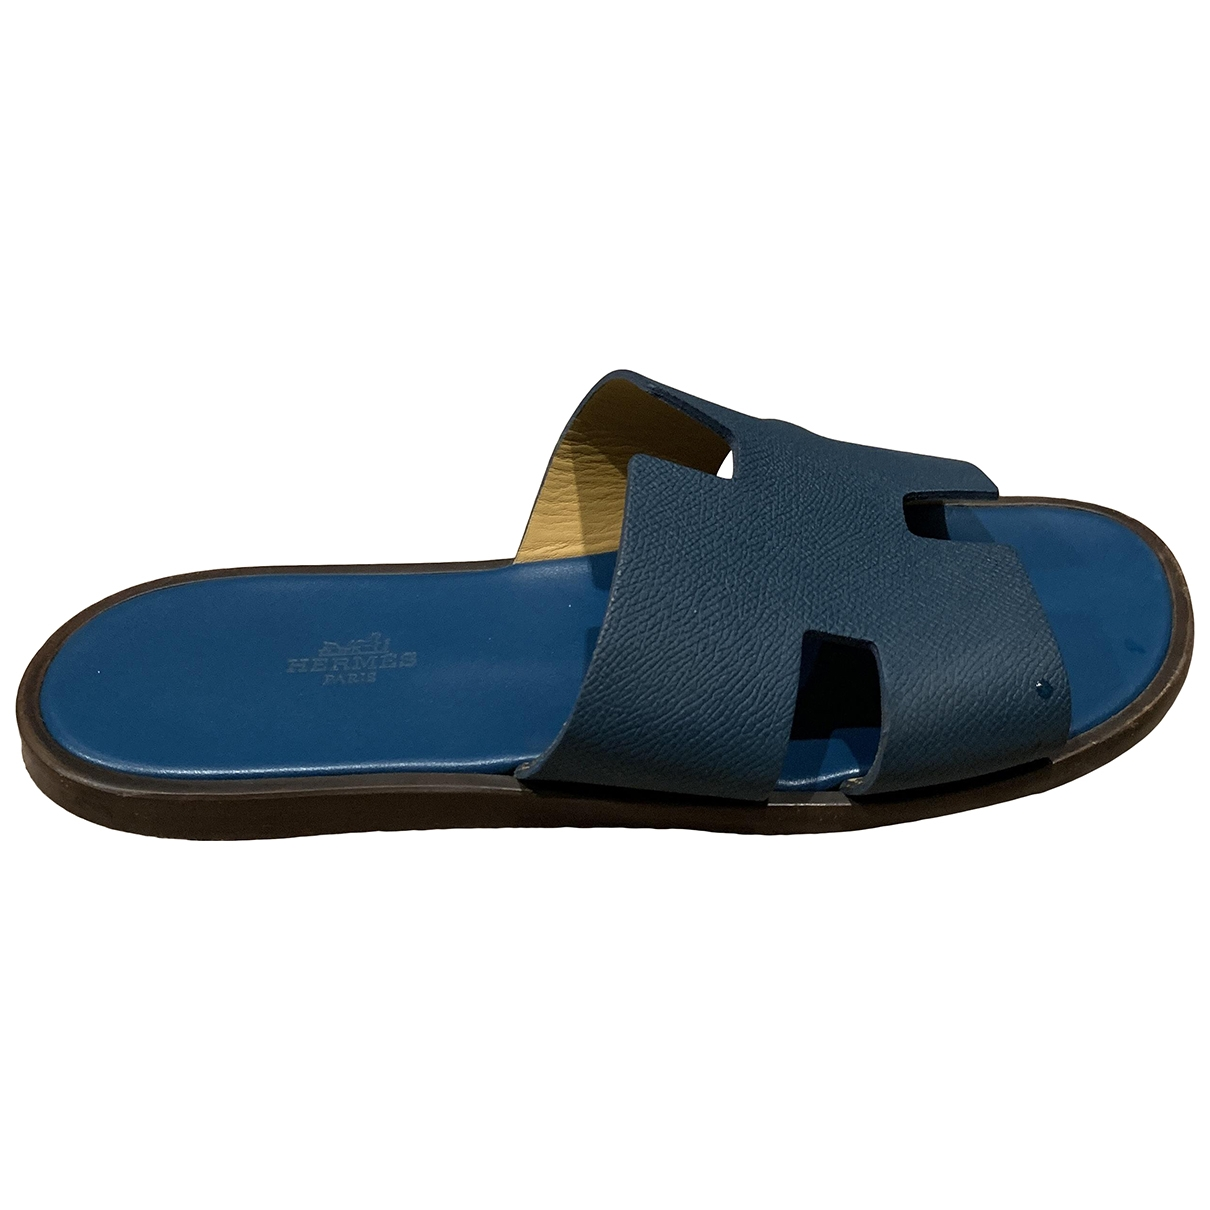 Hermès Izmir Navy Leather Sandals for Men 42 EU